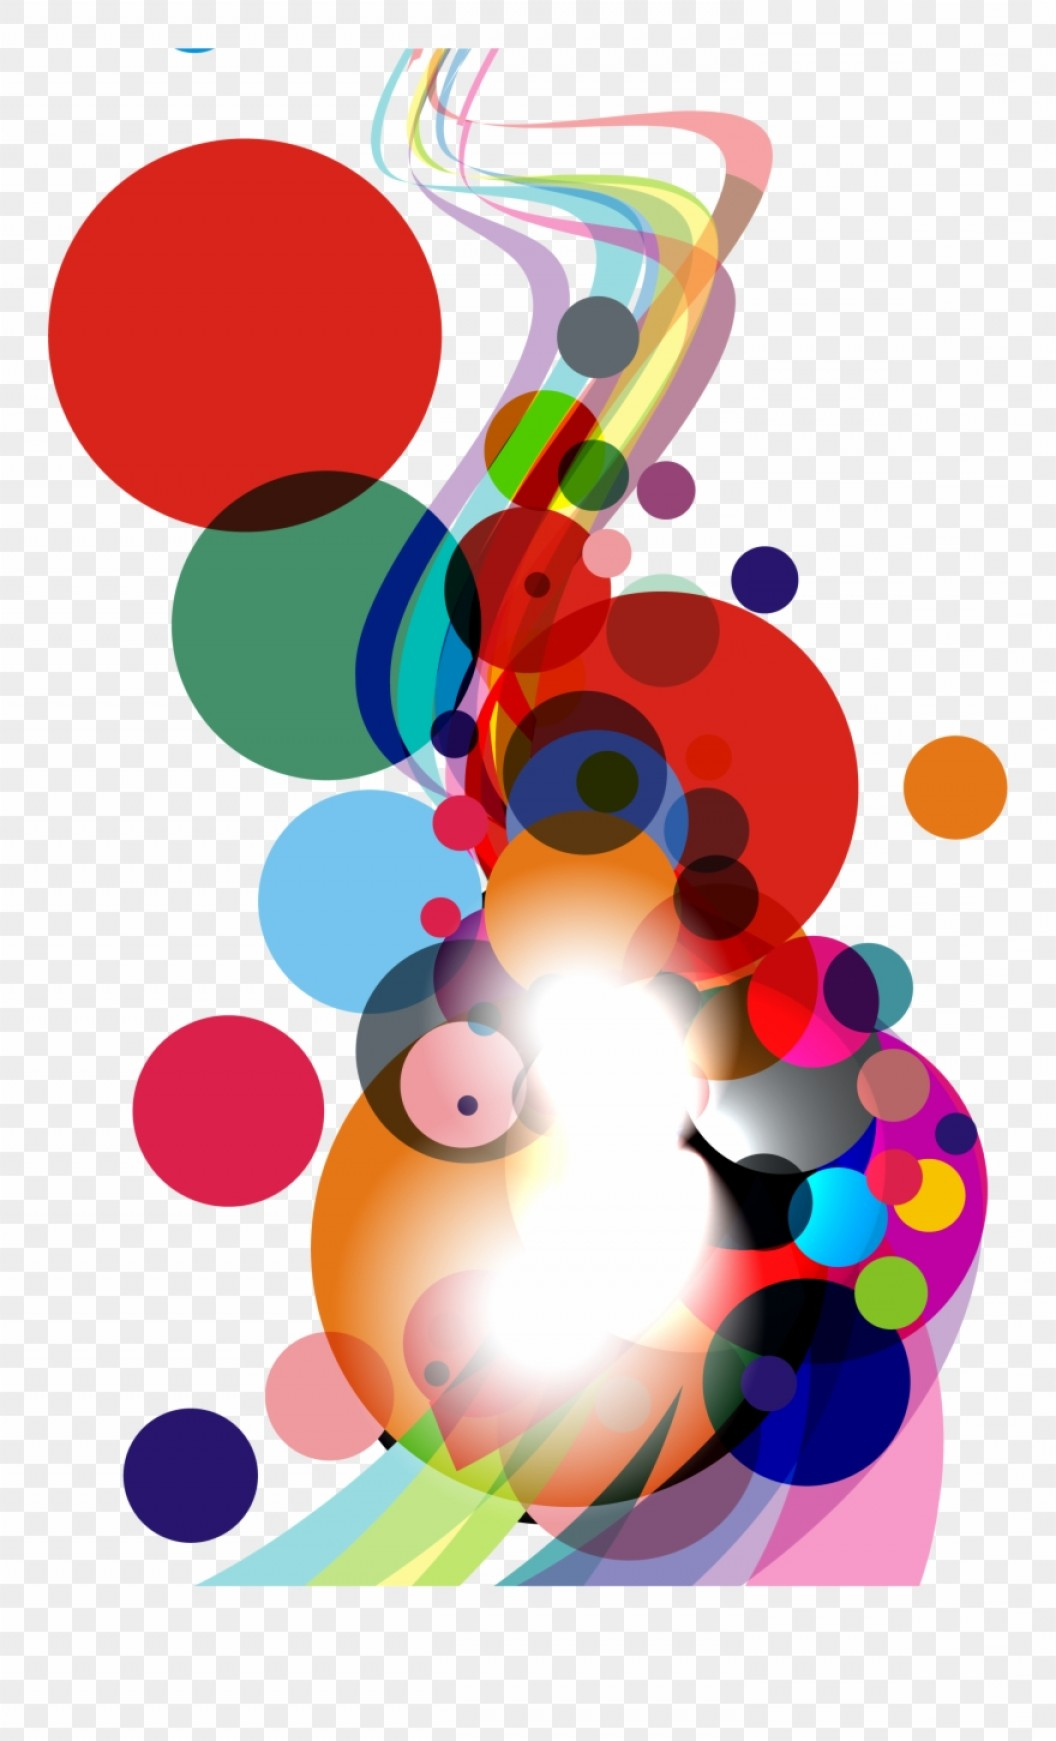 Twm clipart vector royalty free library Red Abstract Design Vector Art Png   HandandBeak vector royalty free library